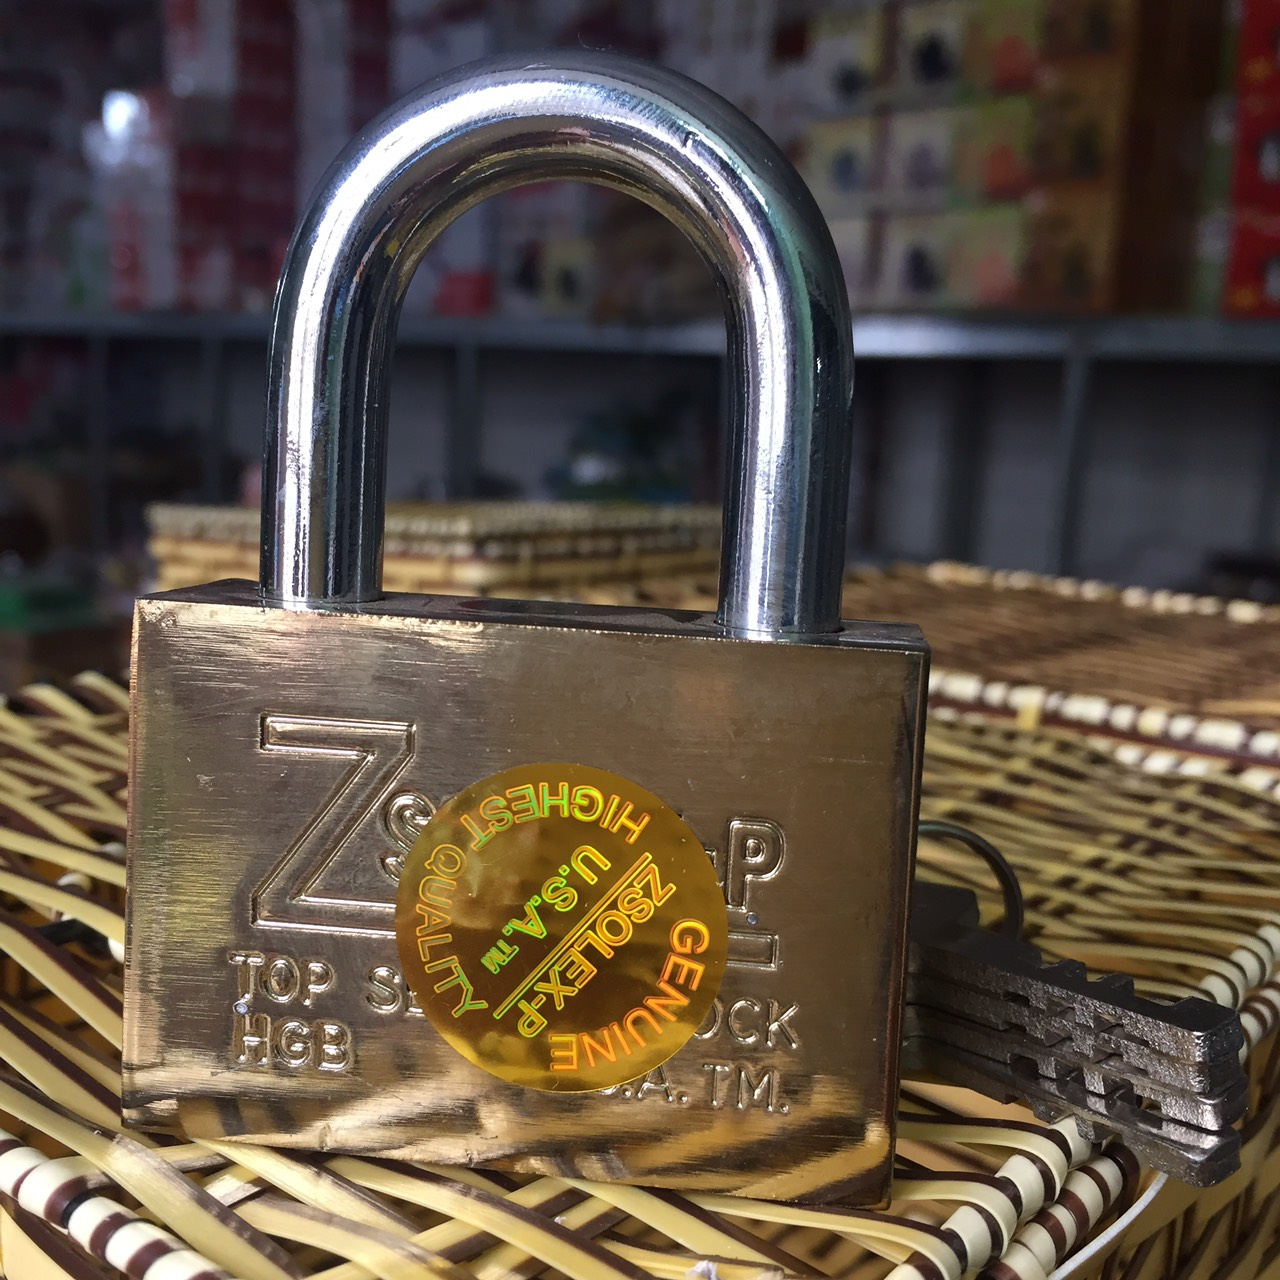 [HCM]DEAL - Ổ khóa  Zsolex loại Lớn 60mm kèm 4 chìa khóa cửa an toàn